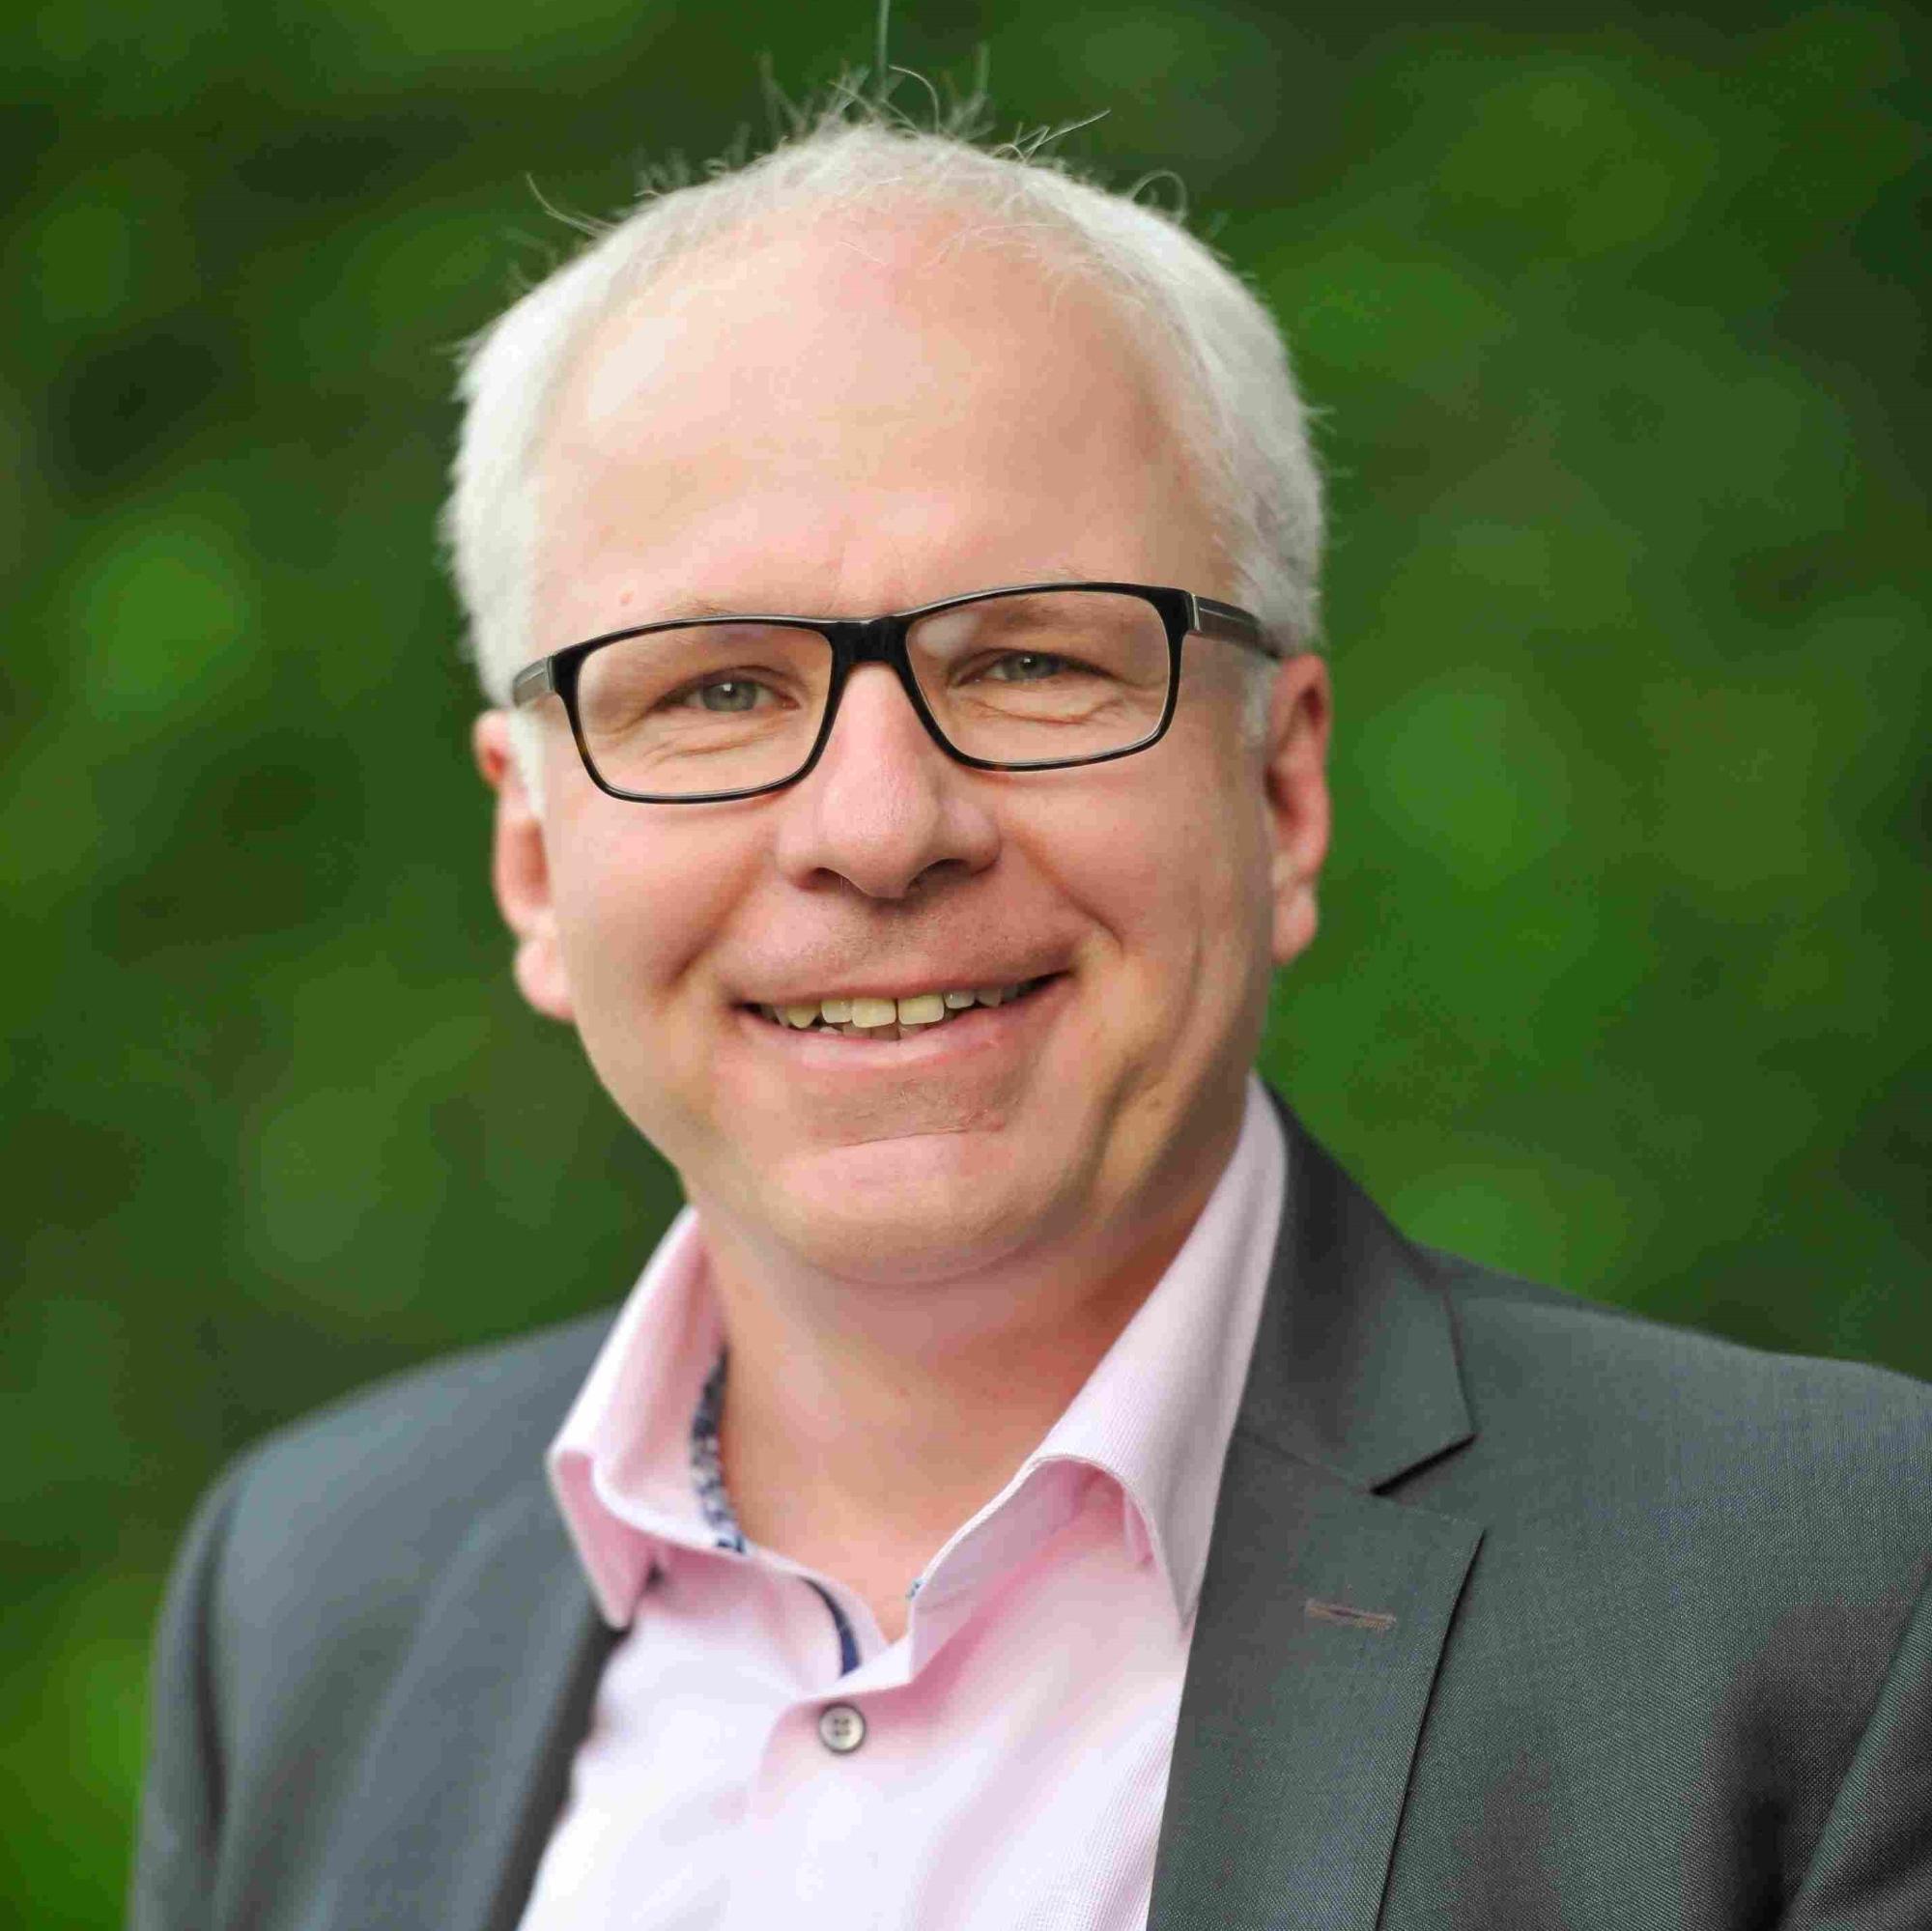 Prof. Dr.-Ing. Wolfram Remlinger